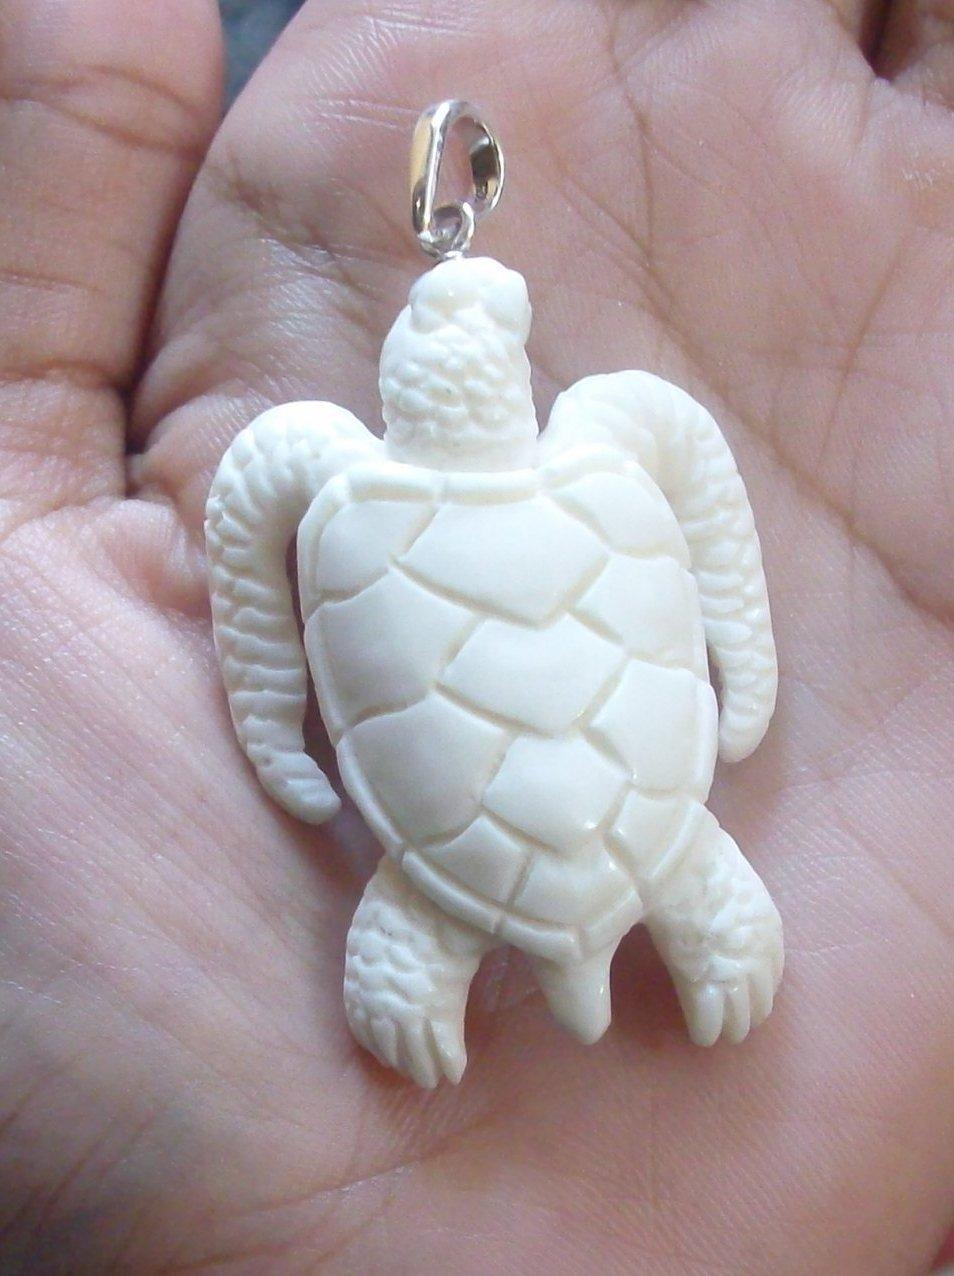 Bali Pendant Necklace TURTLE Double Side F/r Buffalo Bone Carving w/ Silver Bail 925 #r403